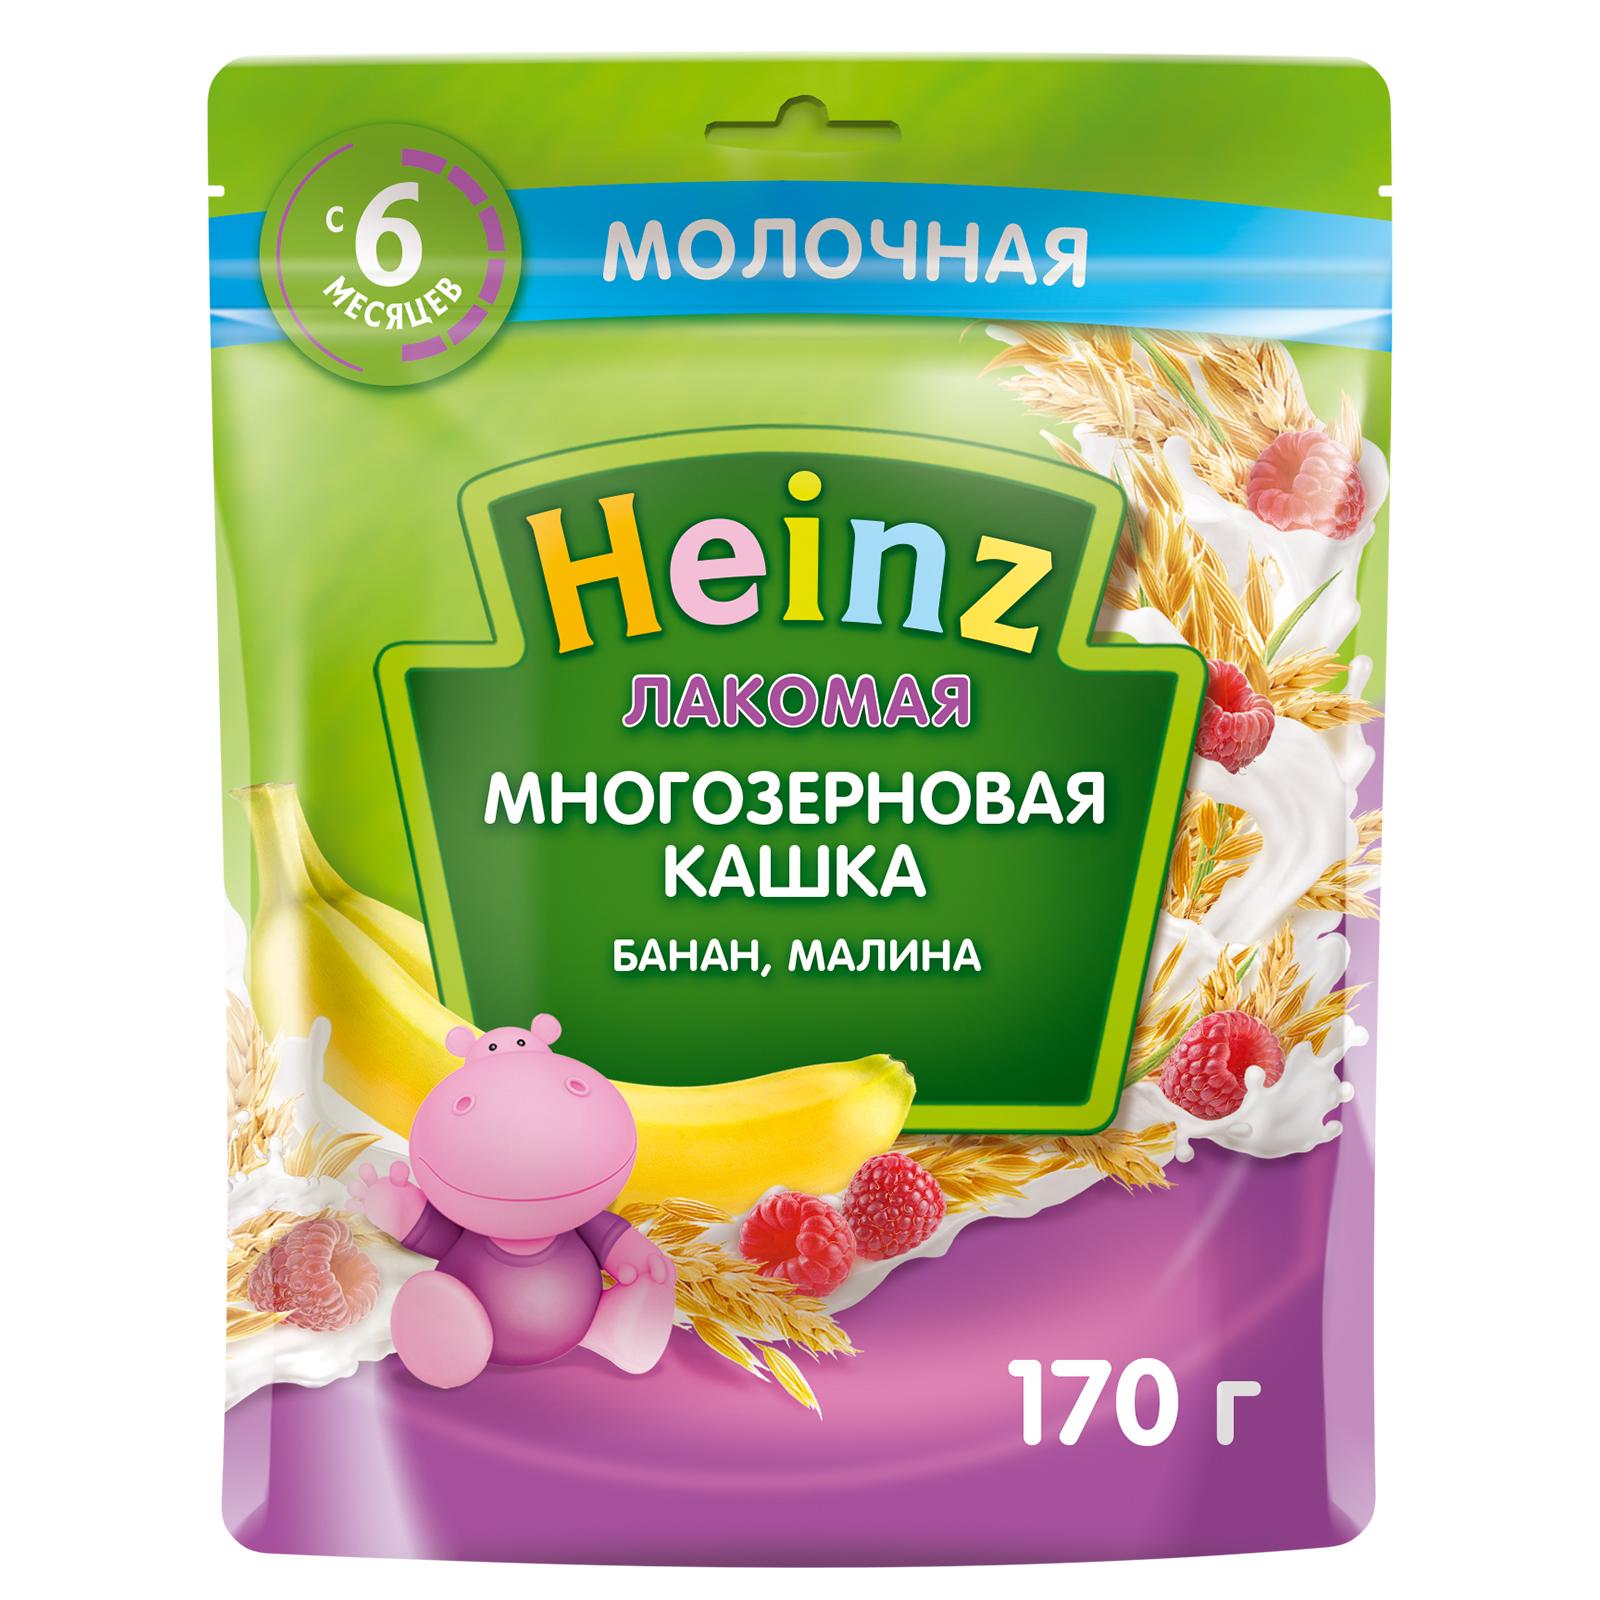 Каша Heinz Лакомая многозерновая Банан малина с 6 месяцев 170 г.